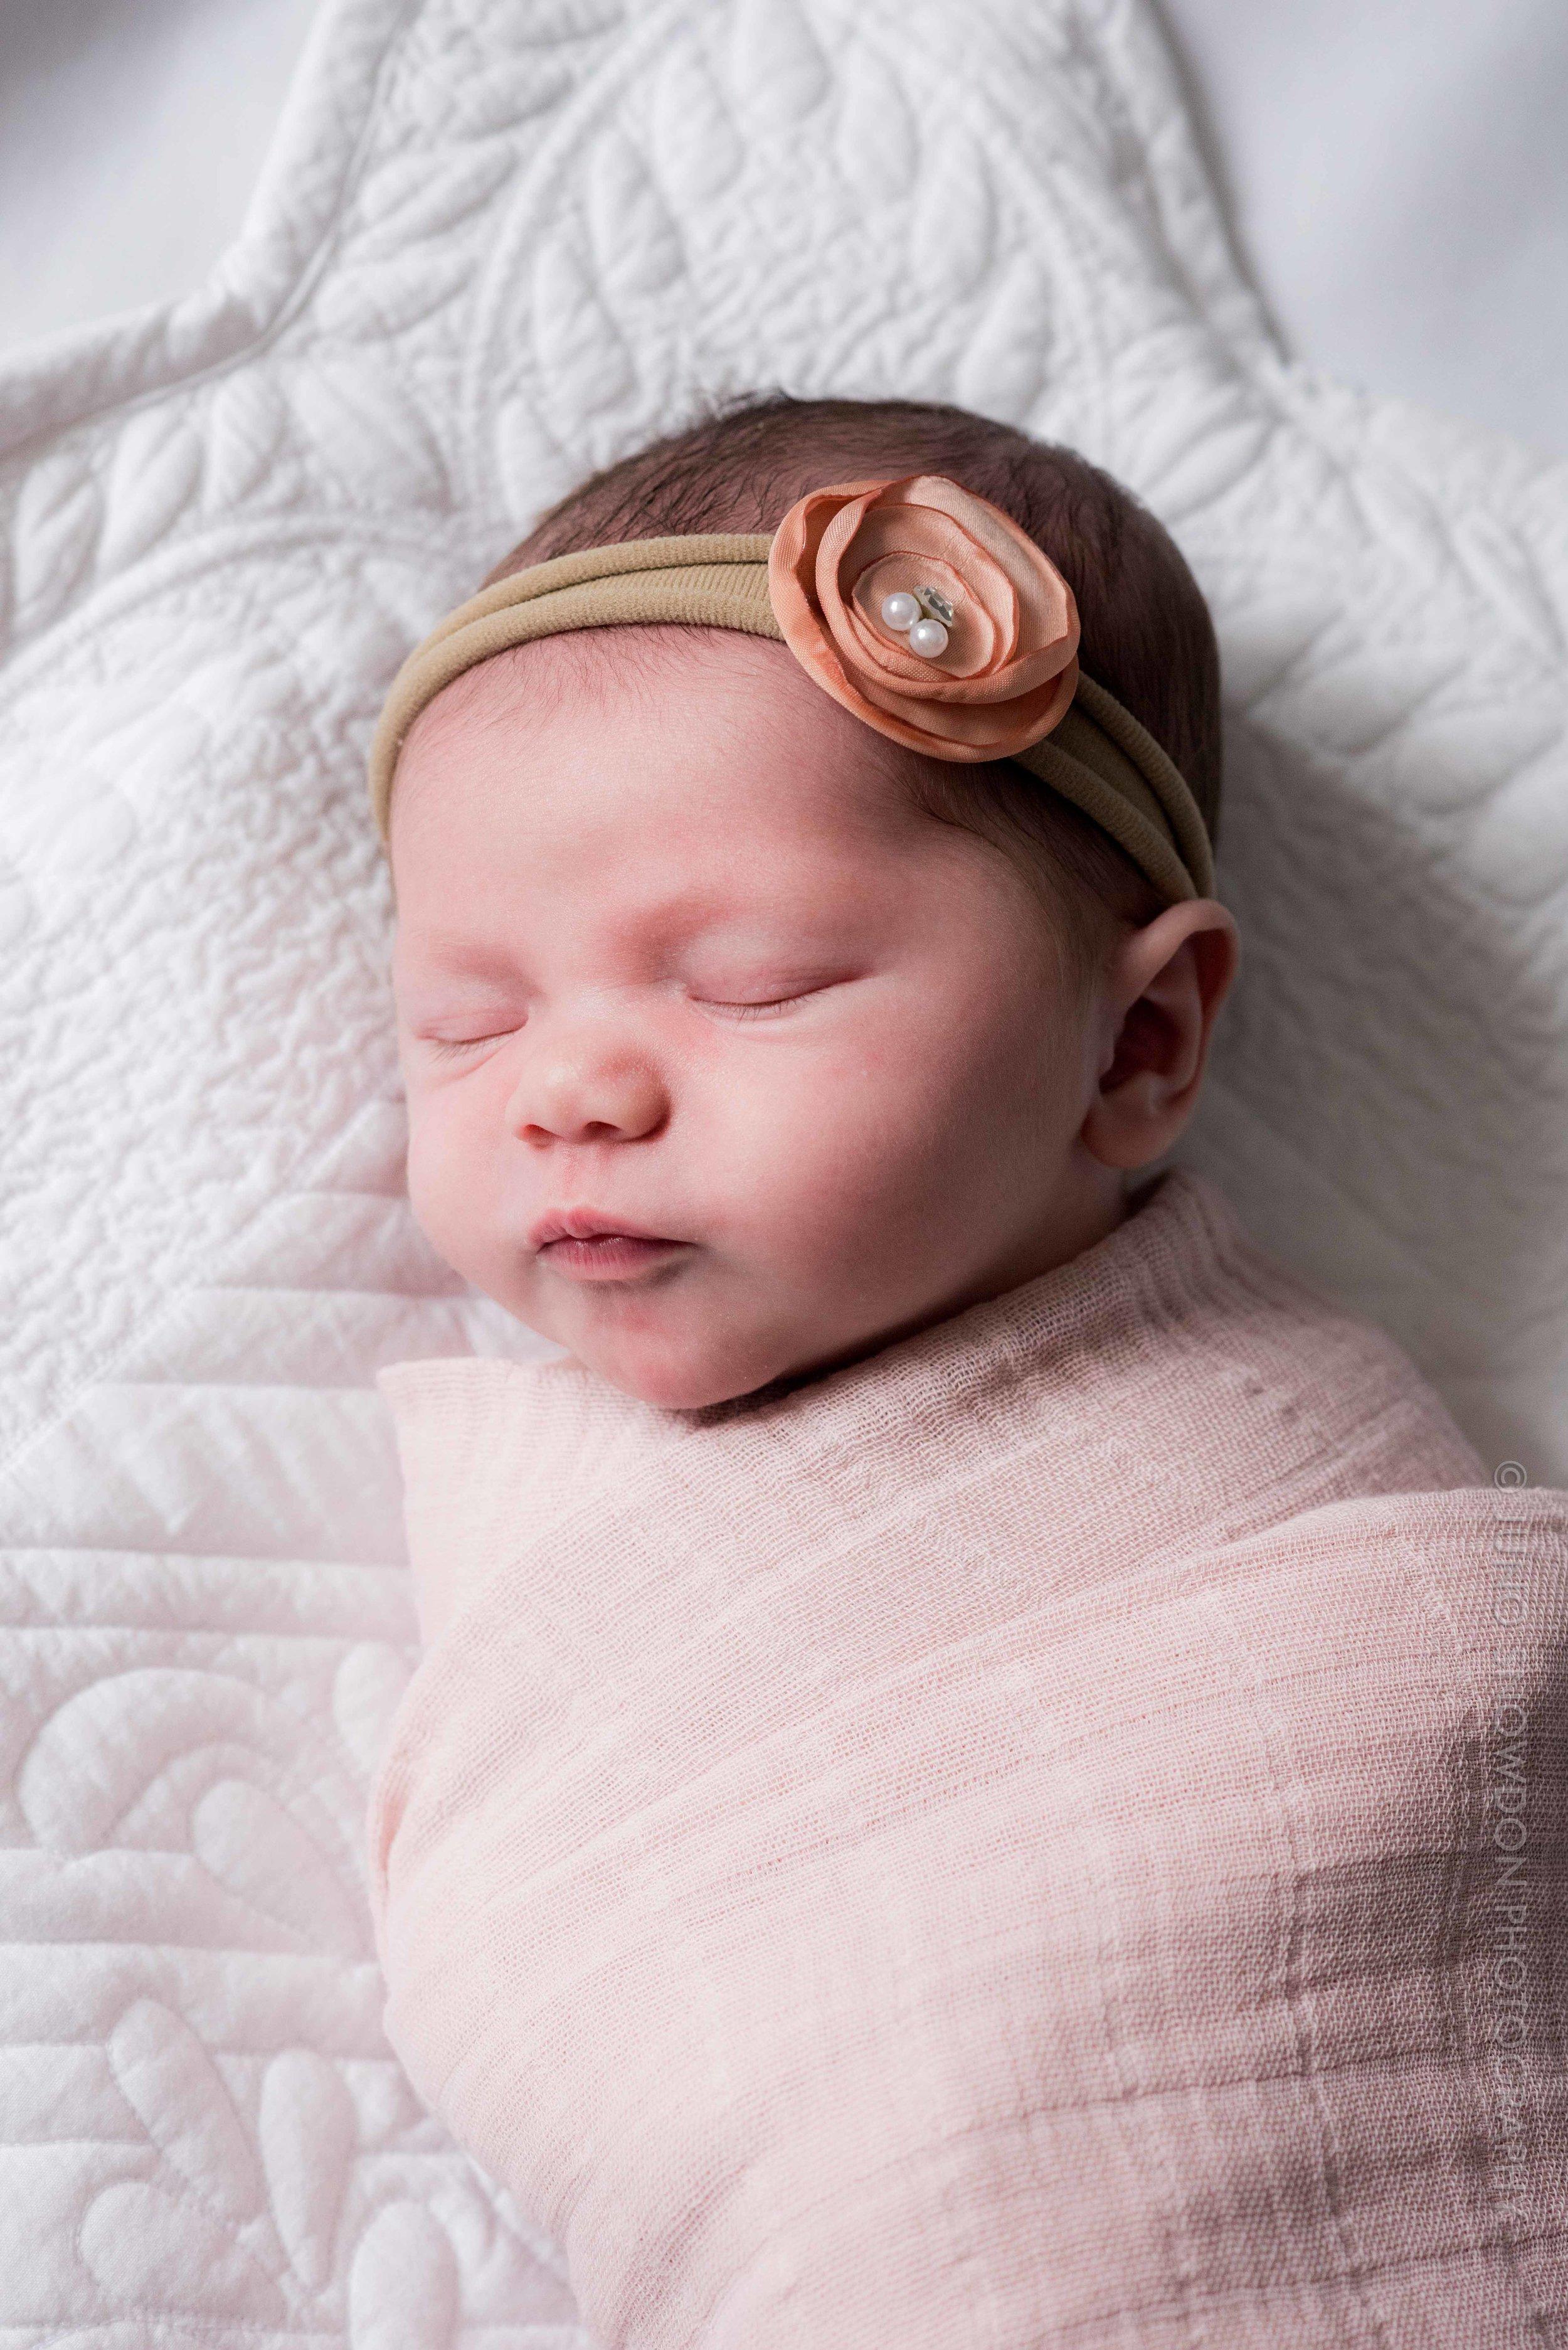 juno-snowdon-photography-newborn-portrait-7313.jpg